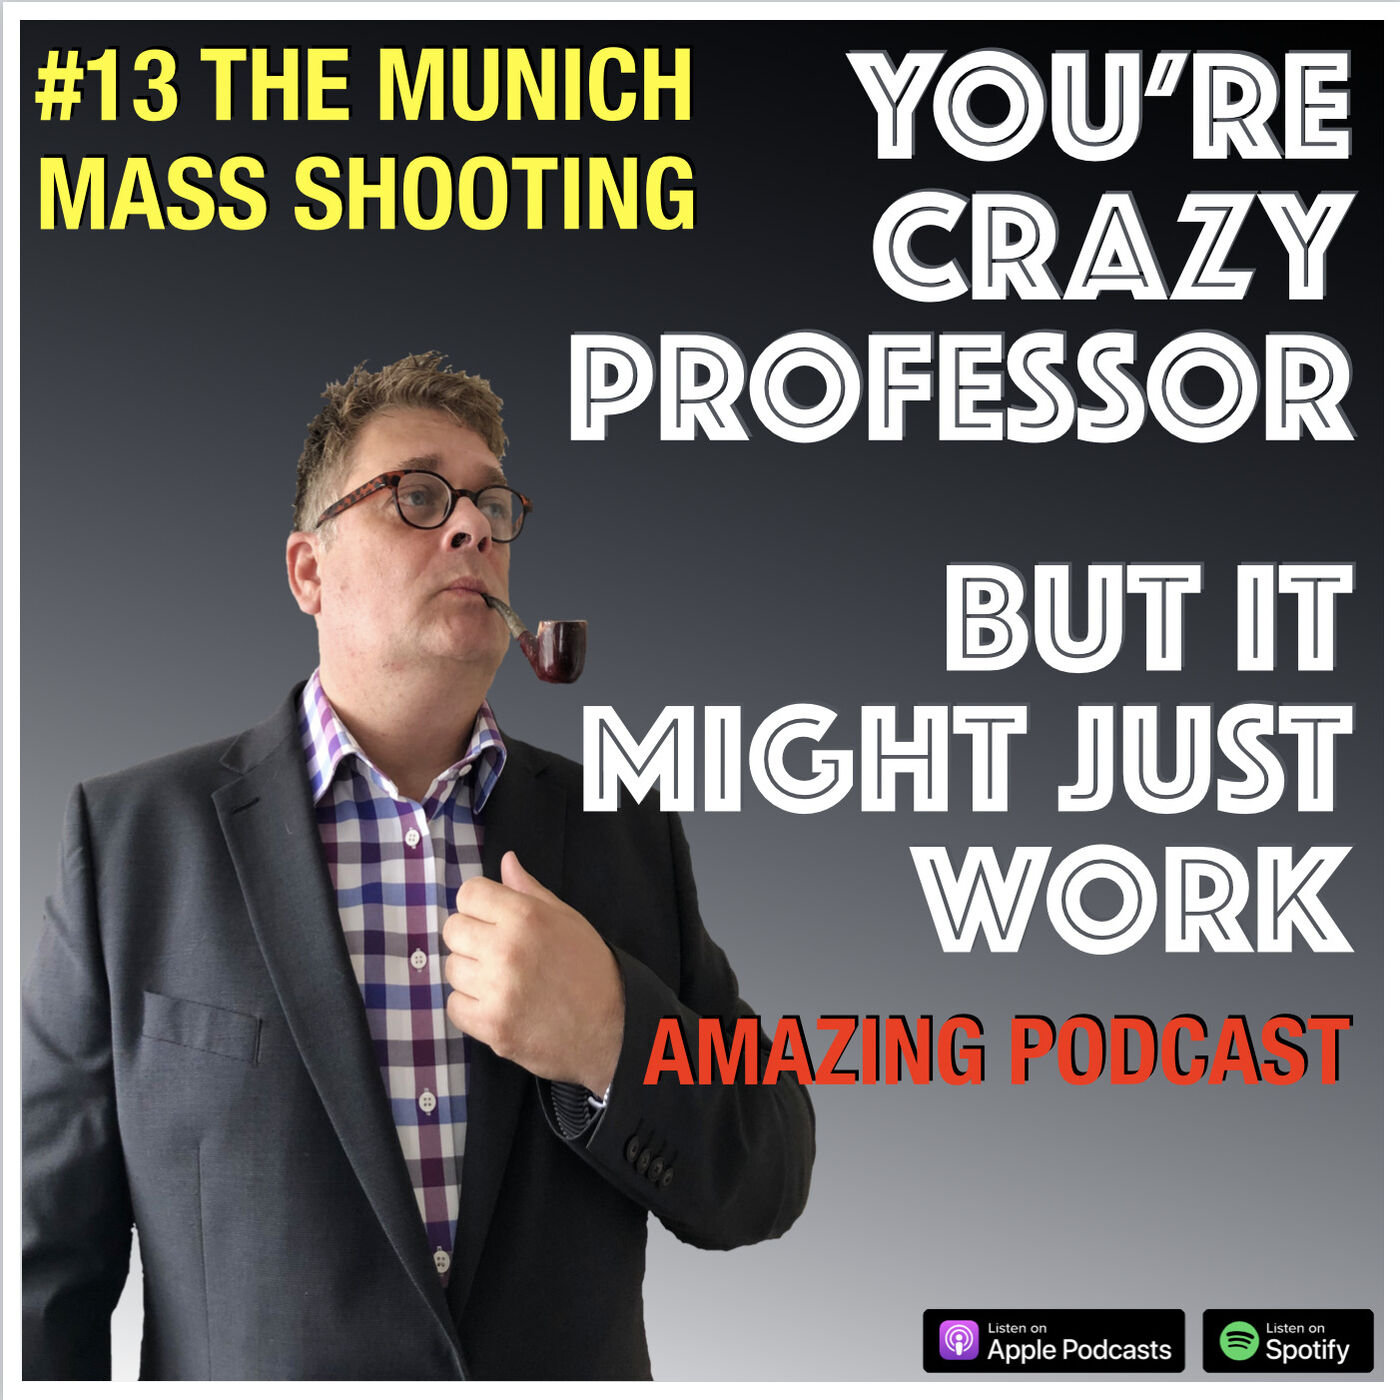 The Munich Mass Shooting 2016